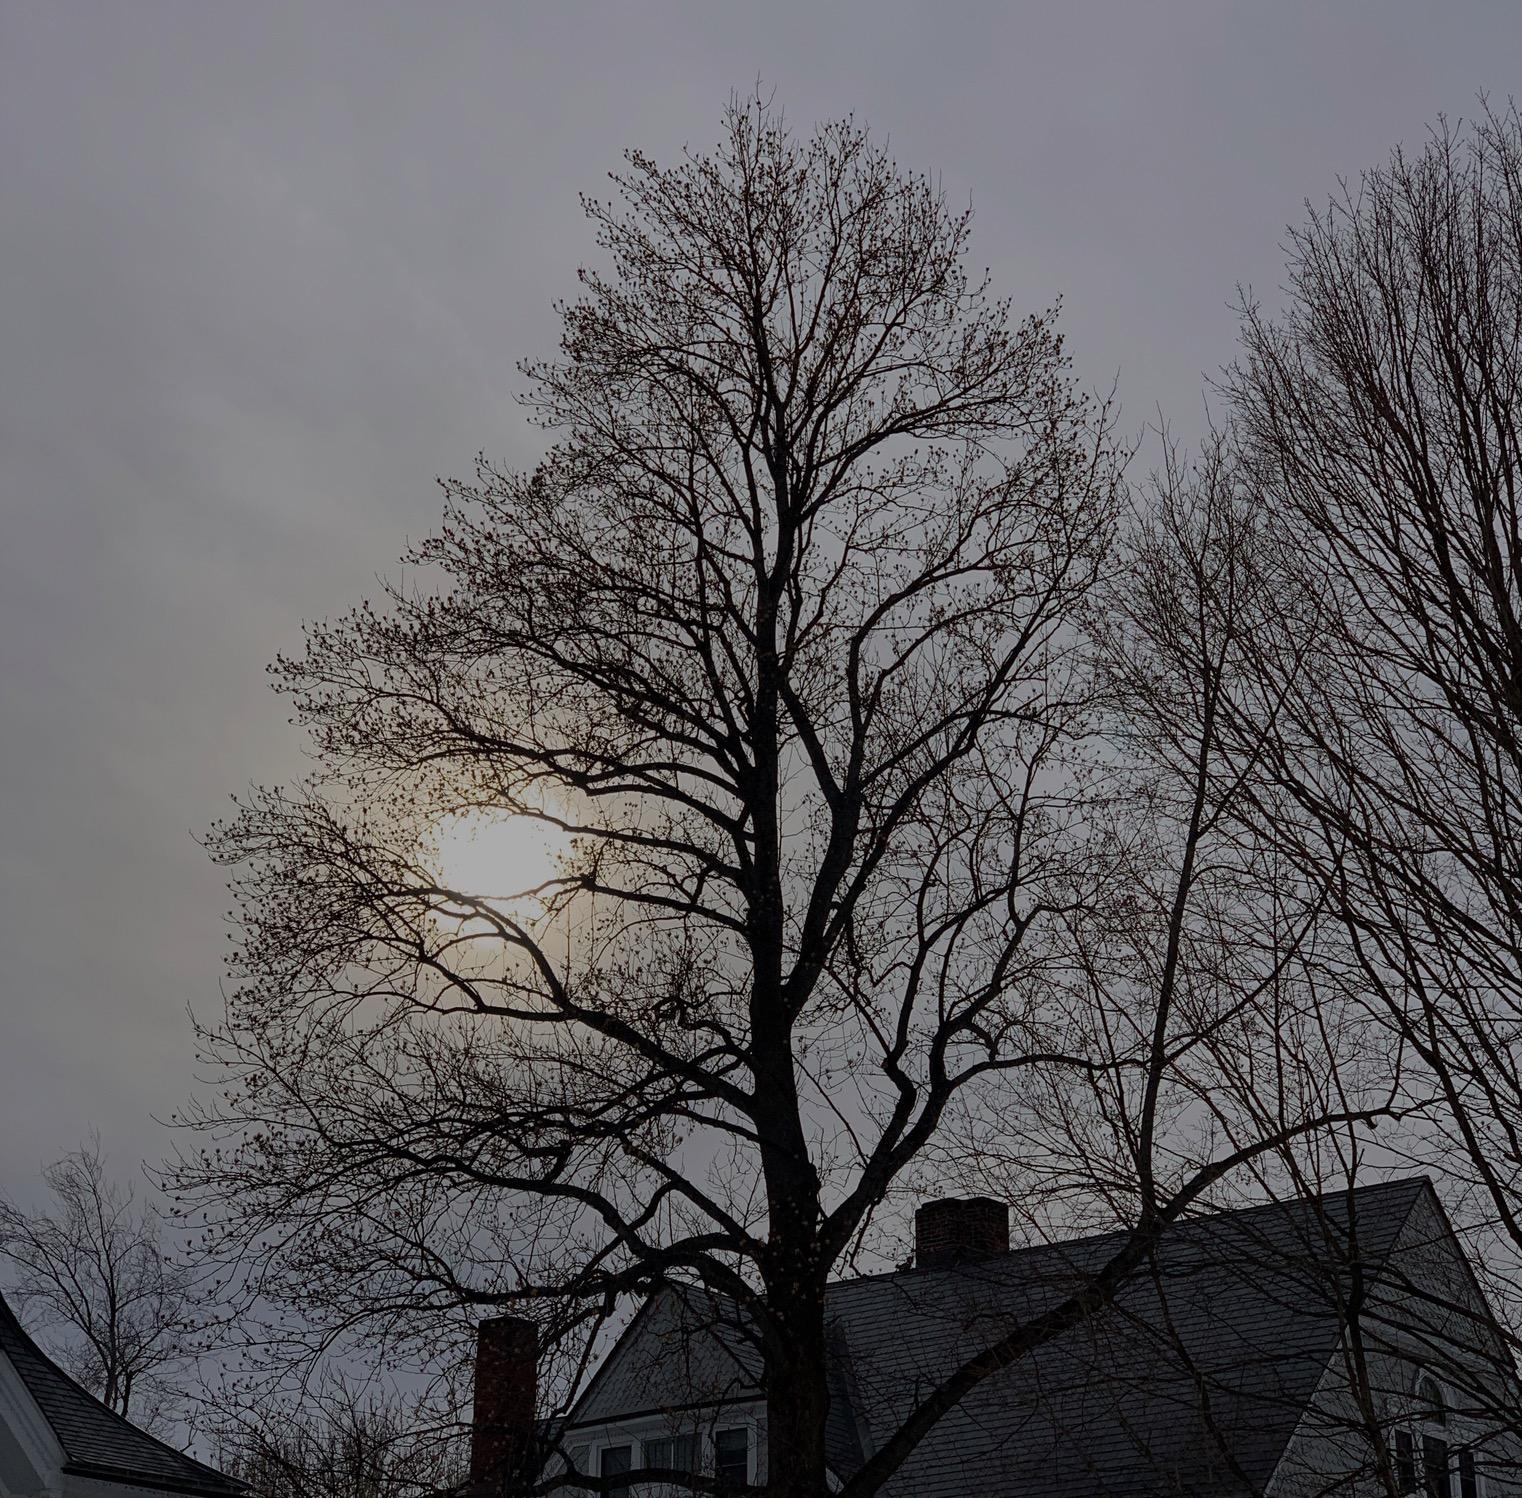 Screen Shot 2019-03-12 at 10.19.37 AM.jpg